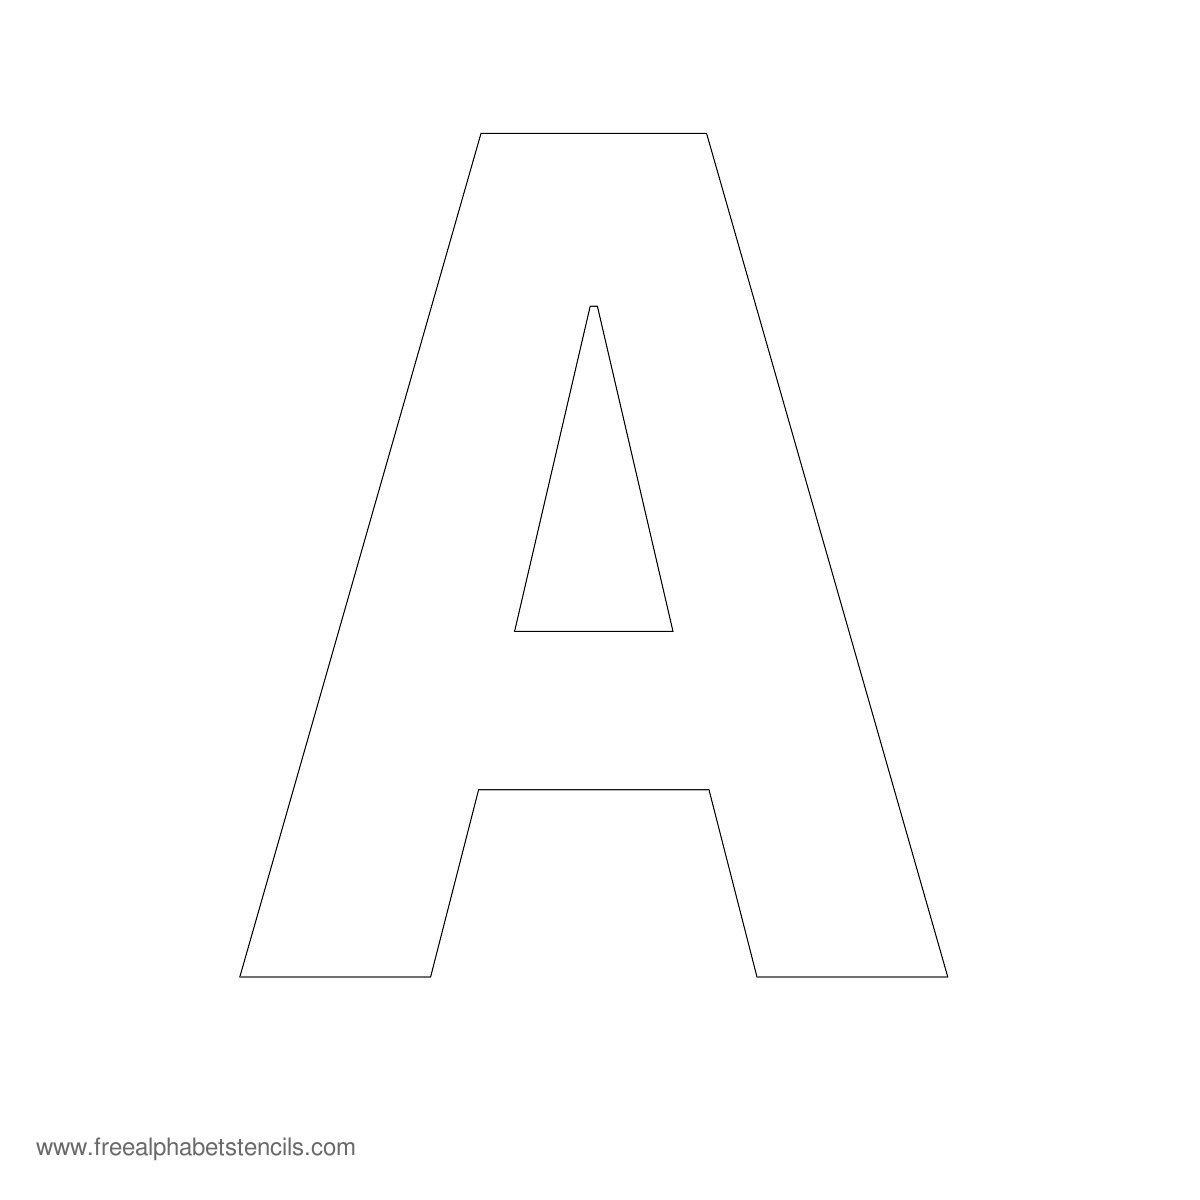 Large Alphabet Stencils | Freealphabetstencils - Free Printable Alphabet Templates